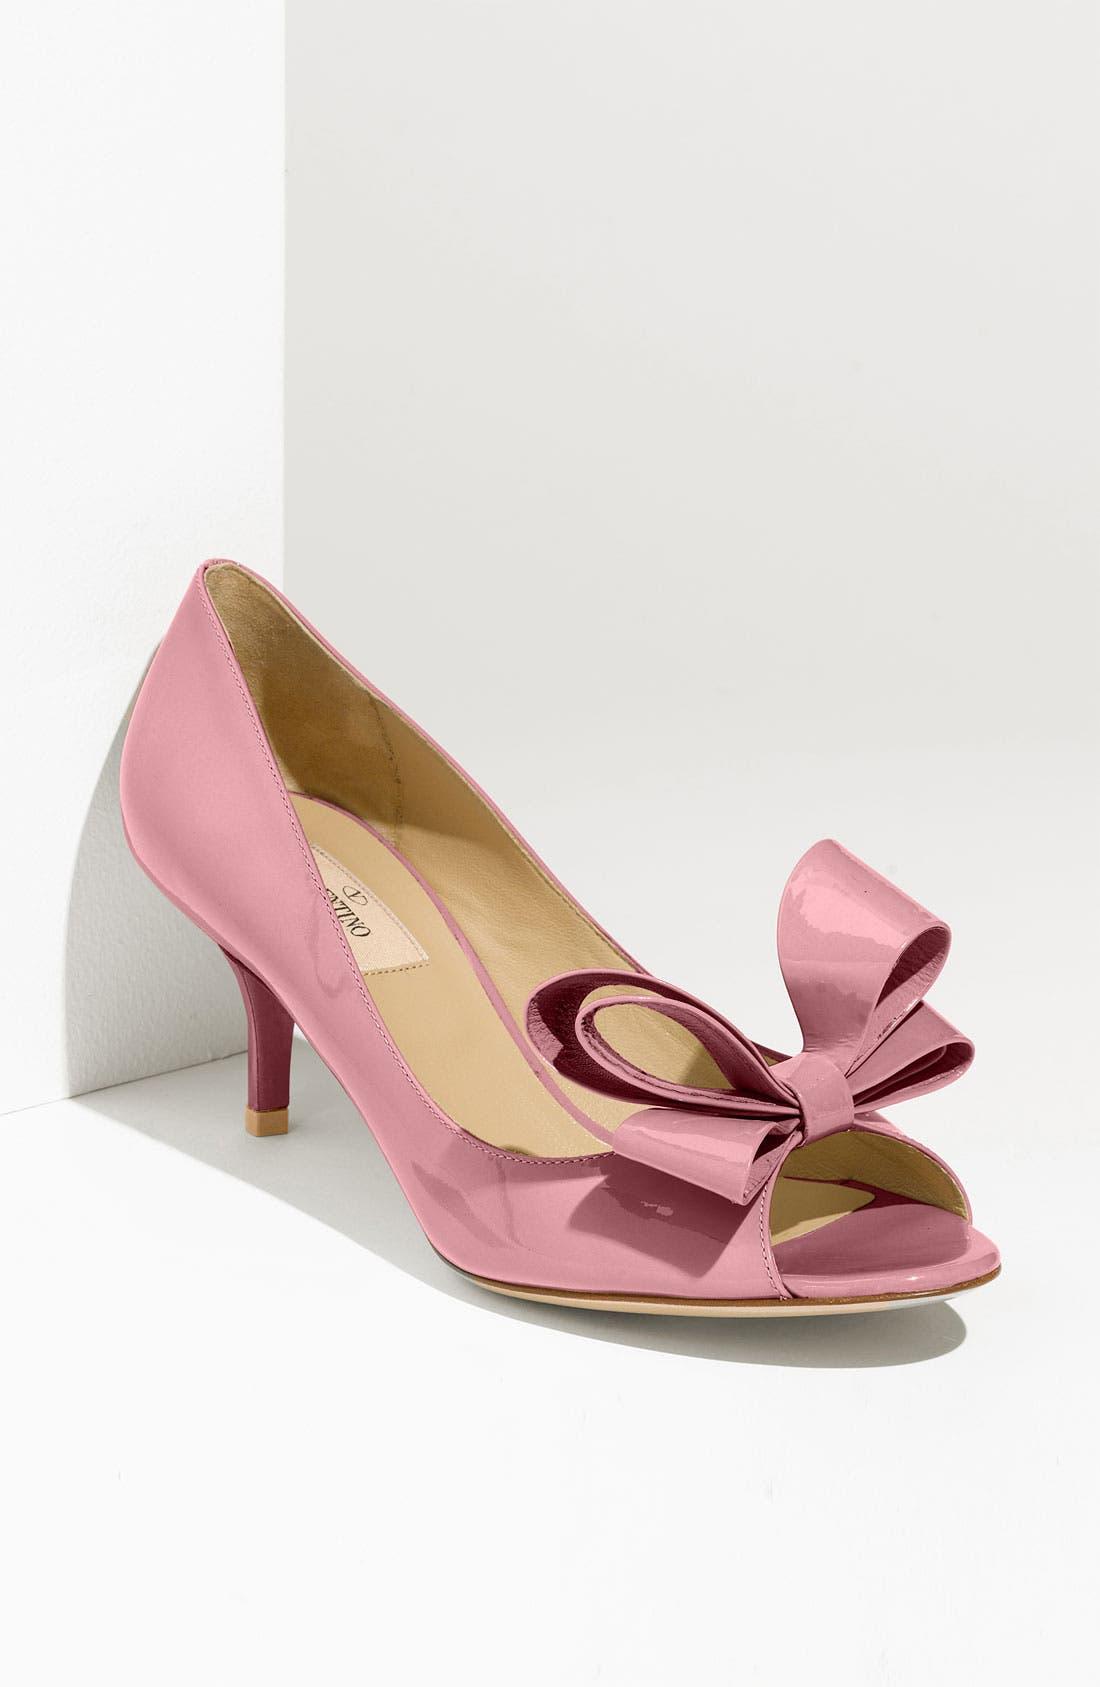 Main Image - VALENTINO GARAVANI Couture Bow Pump (Women)